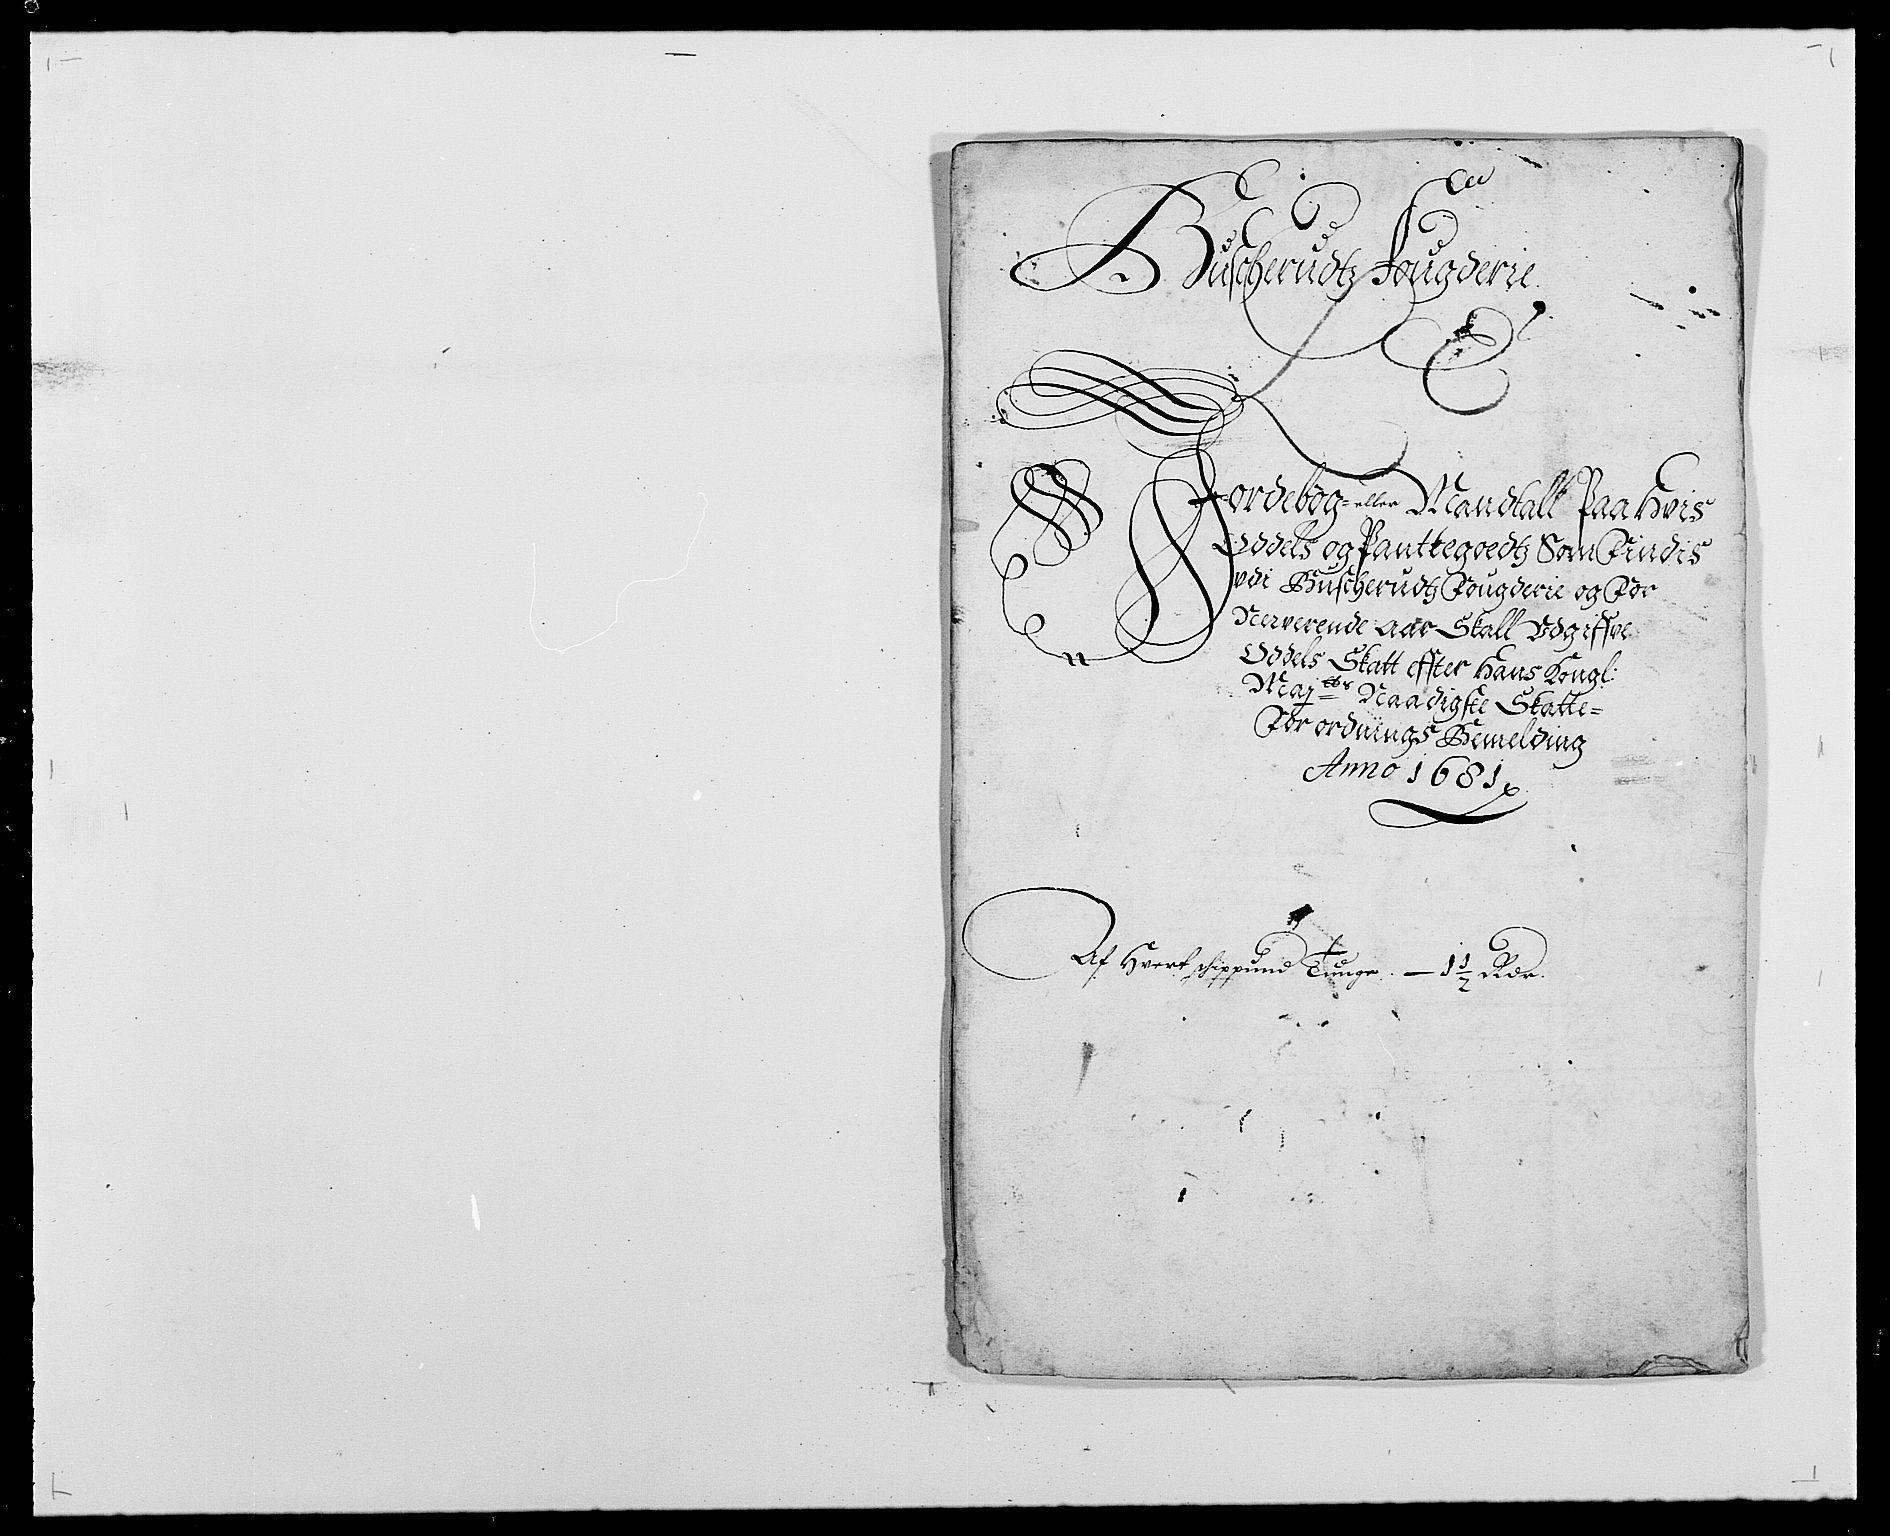 RA, Rentekammeret inntil 1814, Reviderte regnskaper, Fogderegnskap, R25/L1675: Fogderegnskap Buskerud, 1678-1681, s. 307